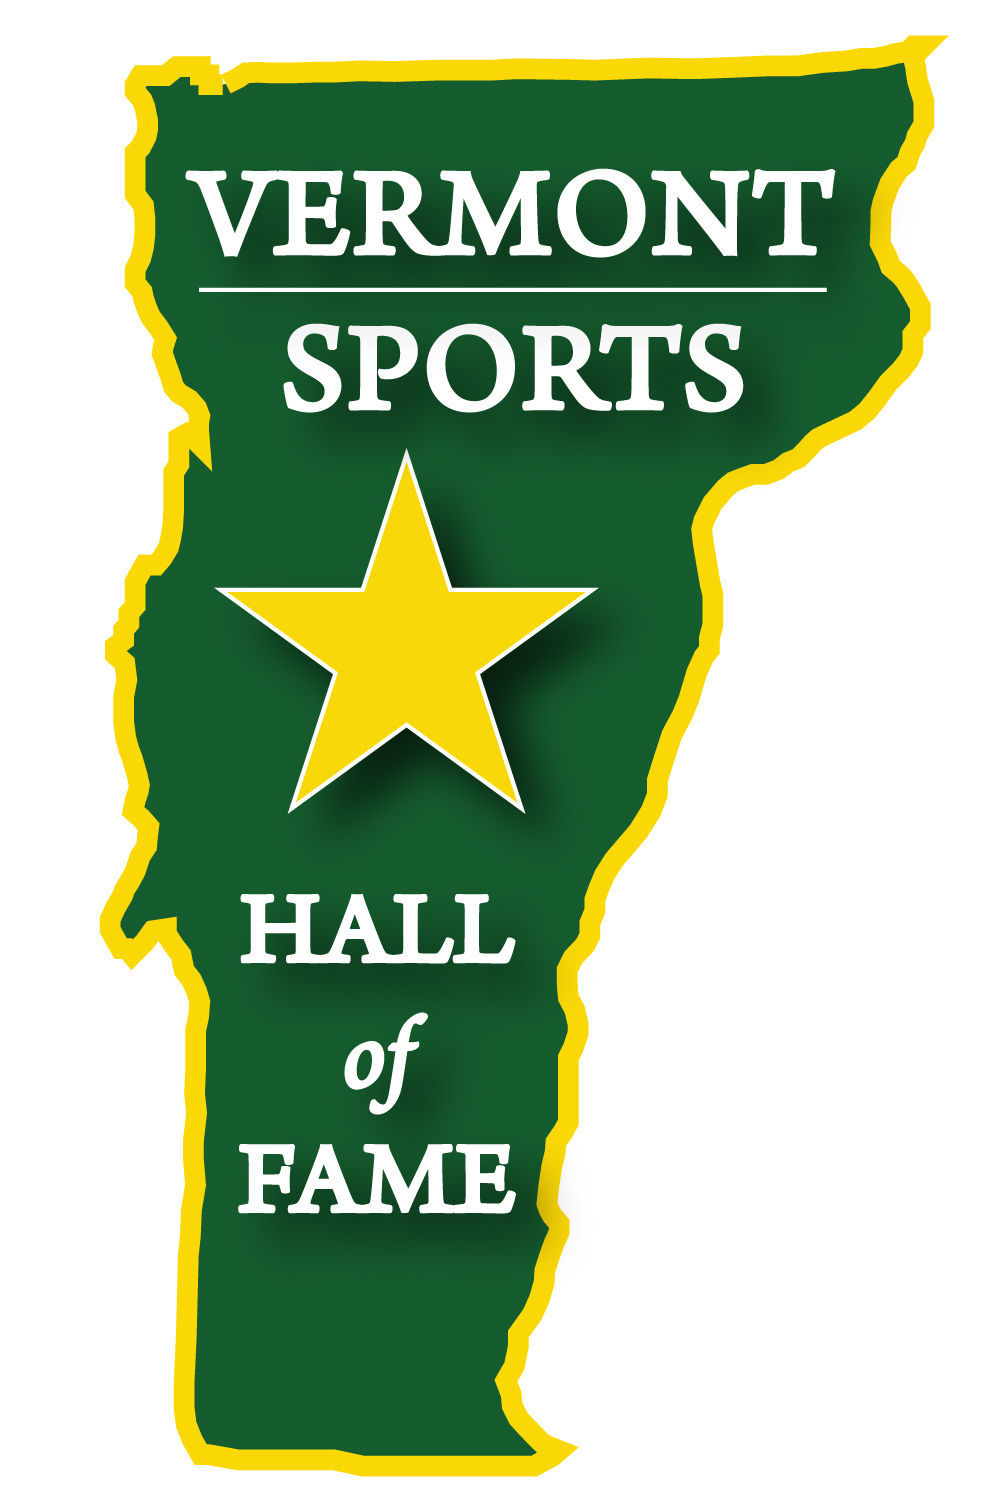 Vt Sports Hall of Fame logo